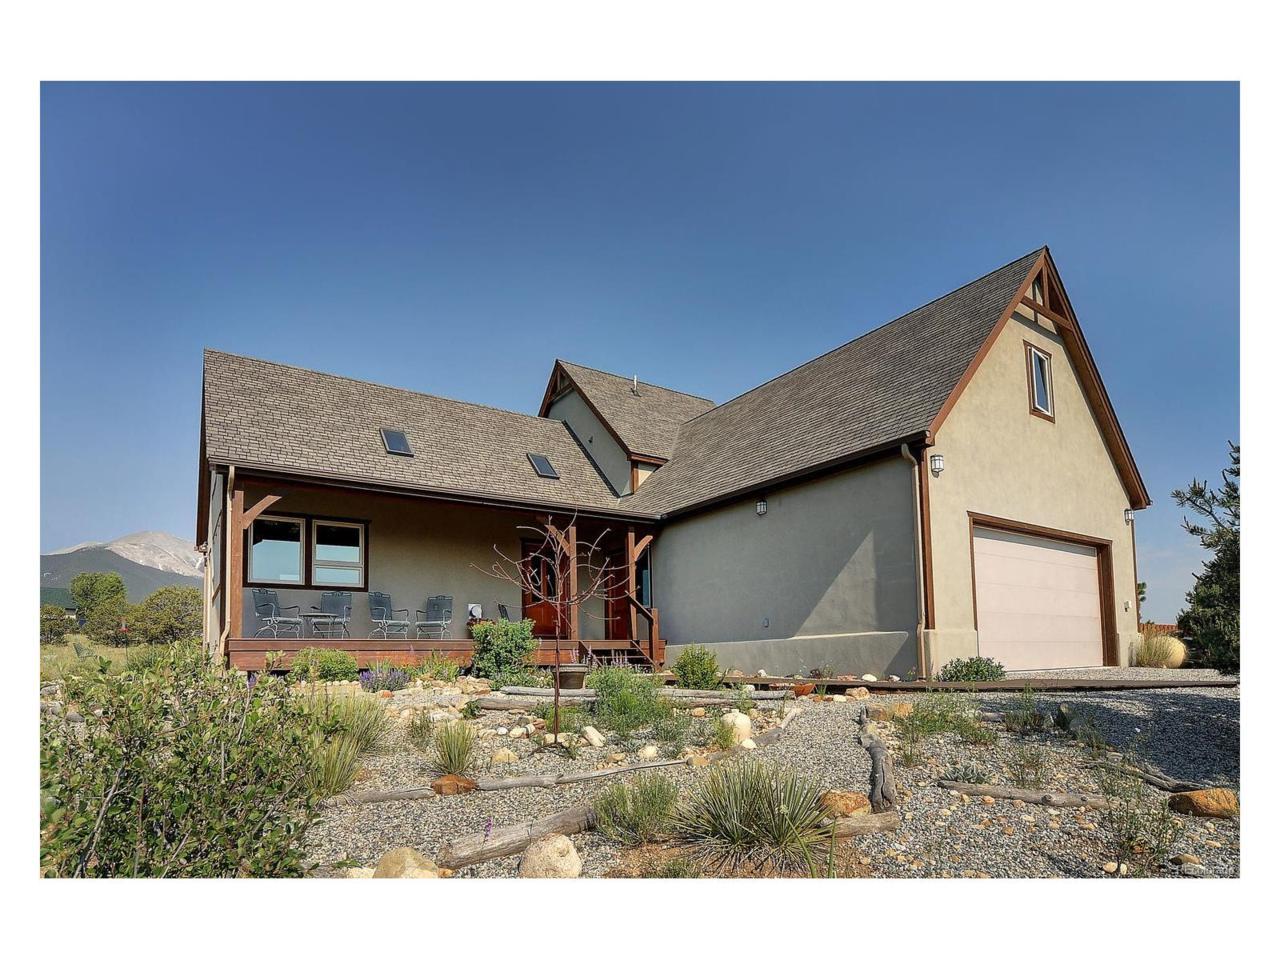 13510 County Road 261D, Nathrop, CO 81236 (MLS #1706153) :: 8z Real Estate